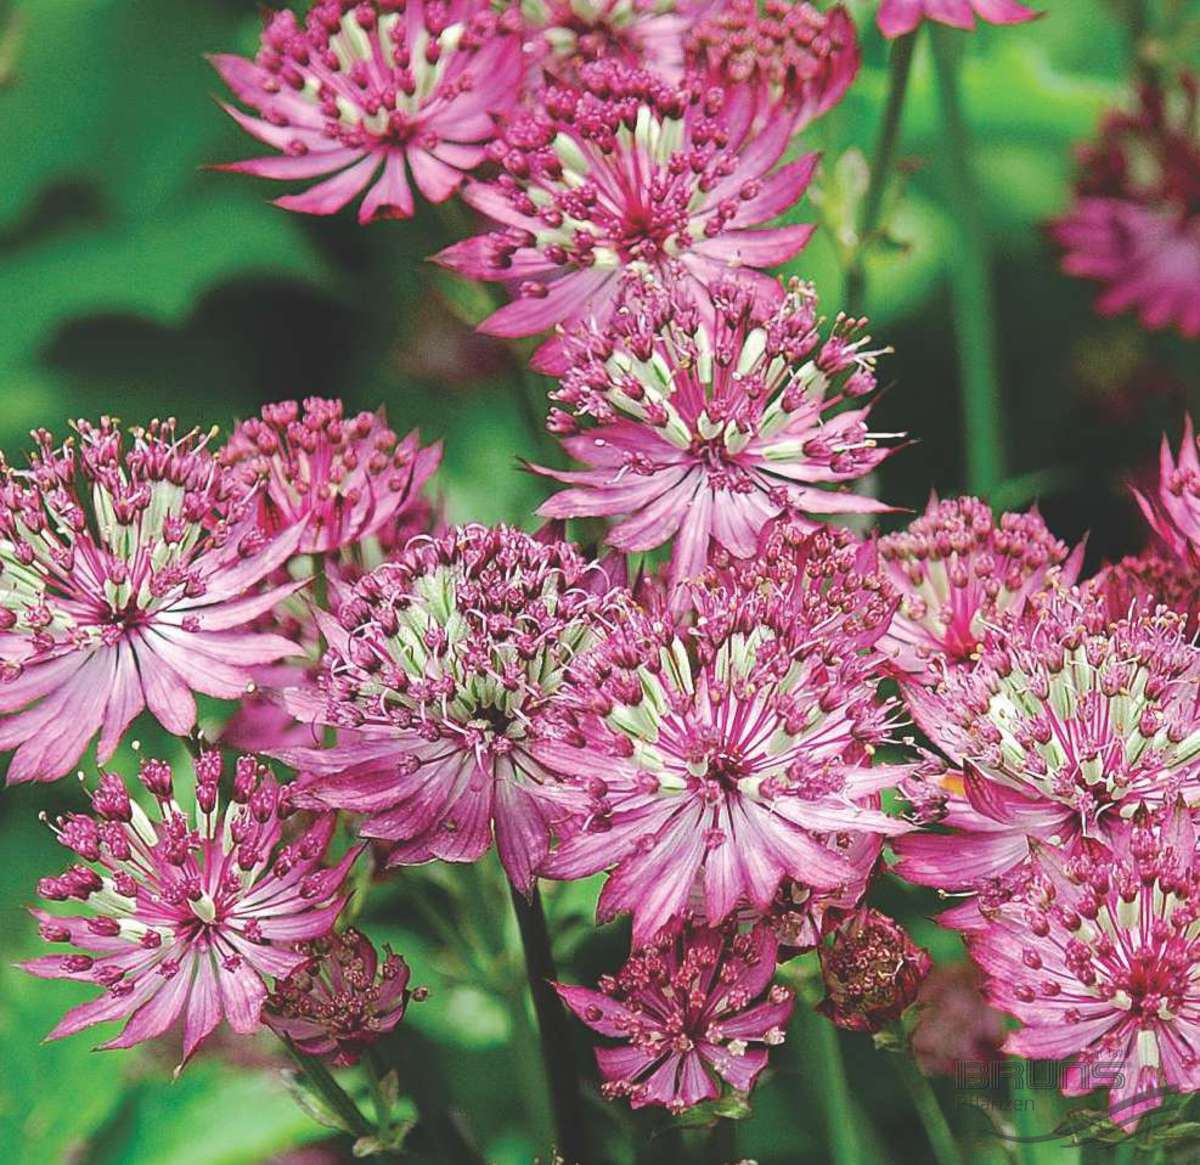 Цветы астранция фото и описание